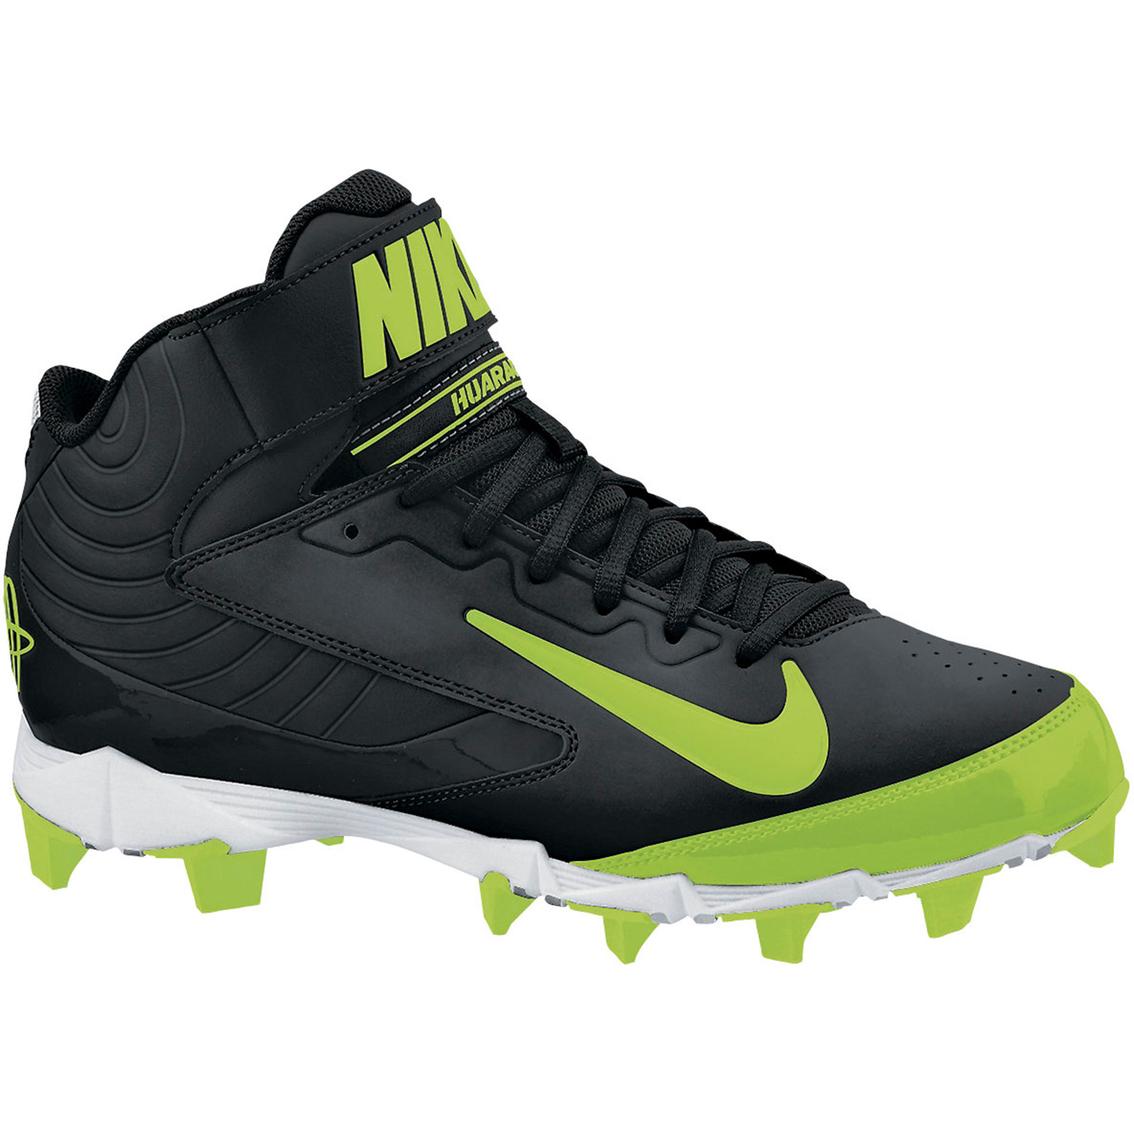 75bb6f79867d Nike Men s Huarache Keystone Baseball Cleats